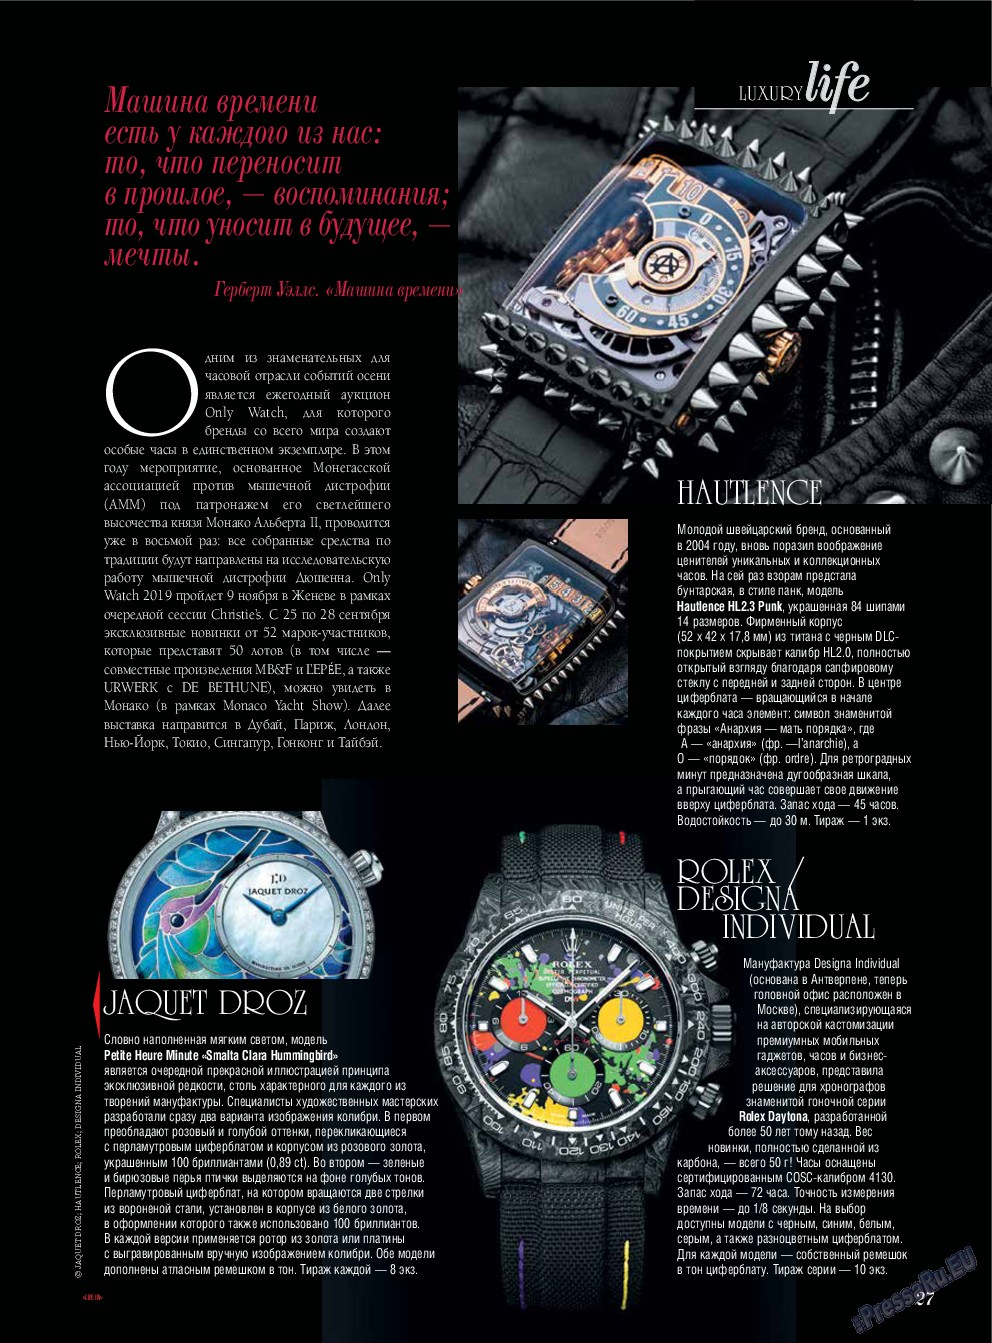 Life in Франкфурт (журнал). 2019 год, номер 44, стр. 27